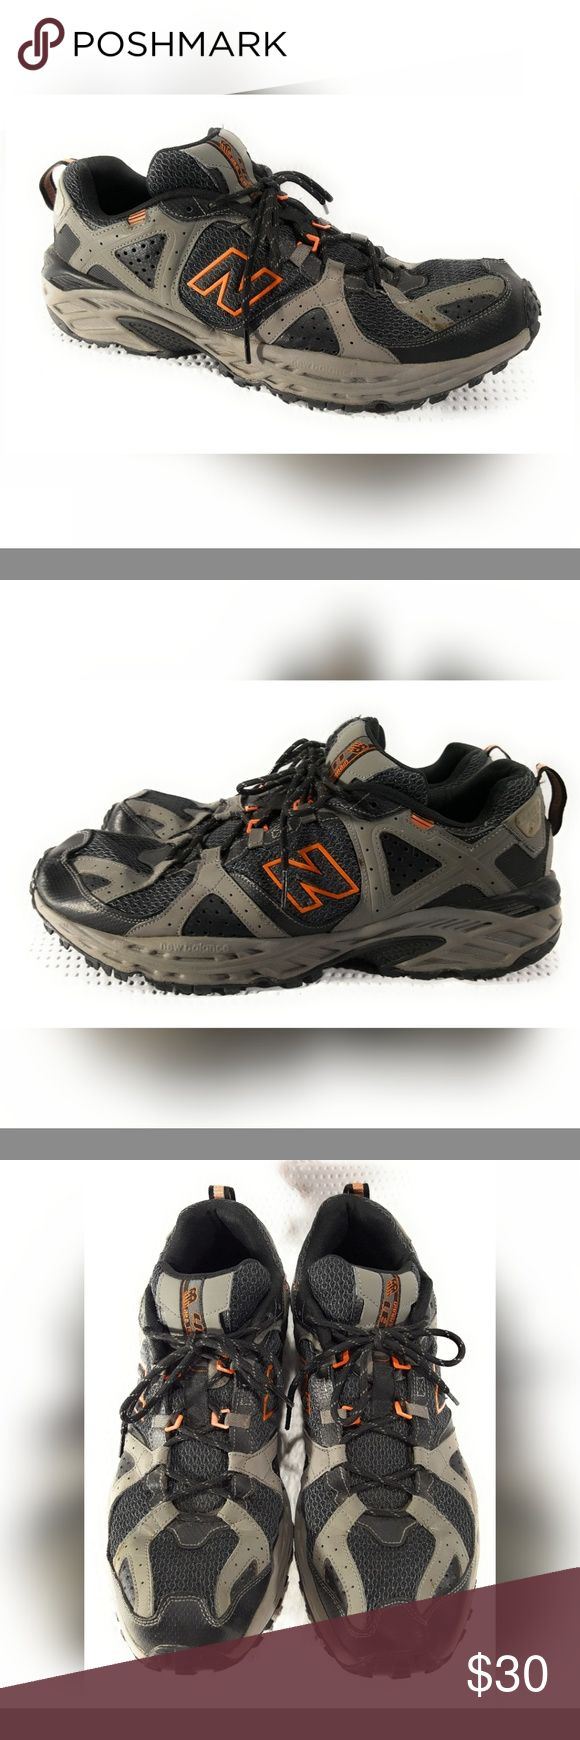 New Balance 481 All Terrain Shoe SZ 14 Excellent Shape Gray Black Orange Ortholite New Balance Shoes Athletic Shoes